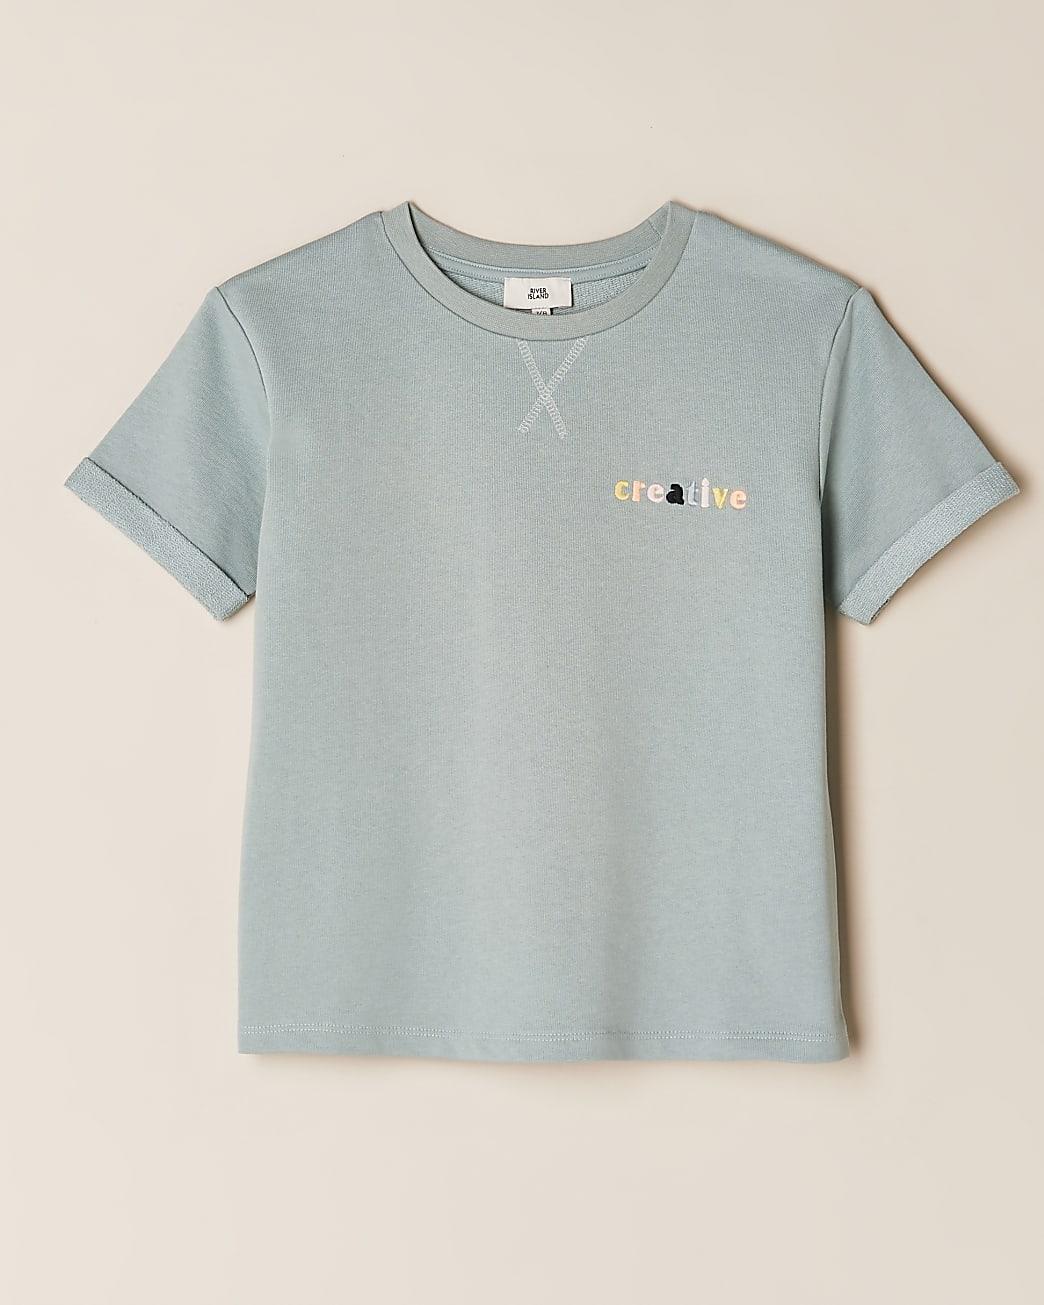 Girls green 'Creative' t-shirt